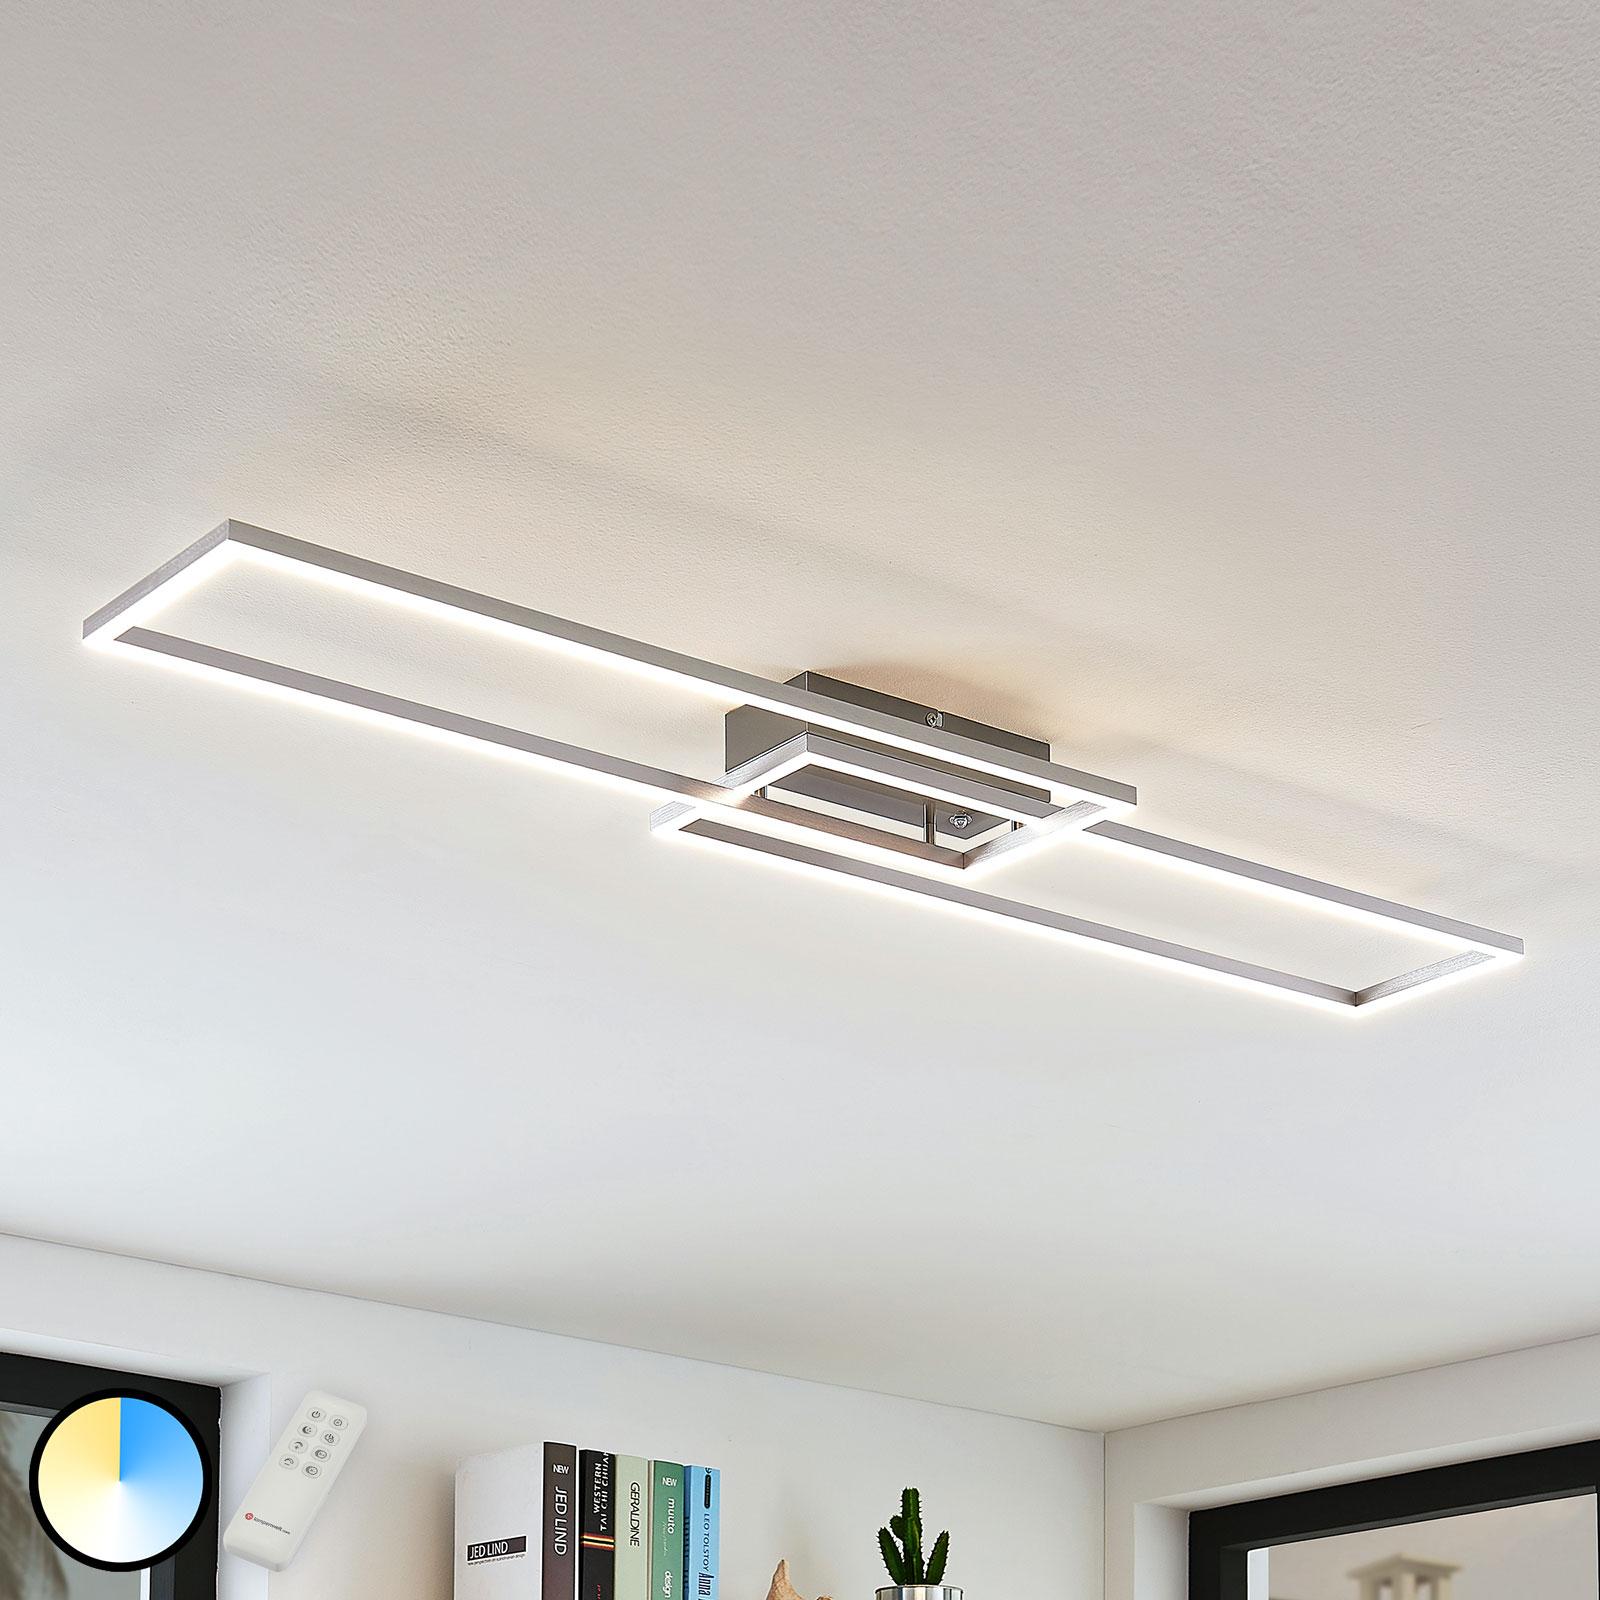 LED-Deckenleuchte Quadra, dimmbar, 2-flg., 110 cm